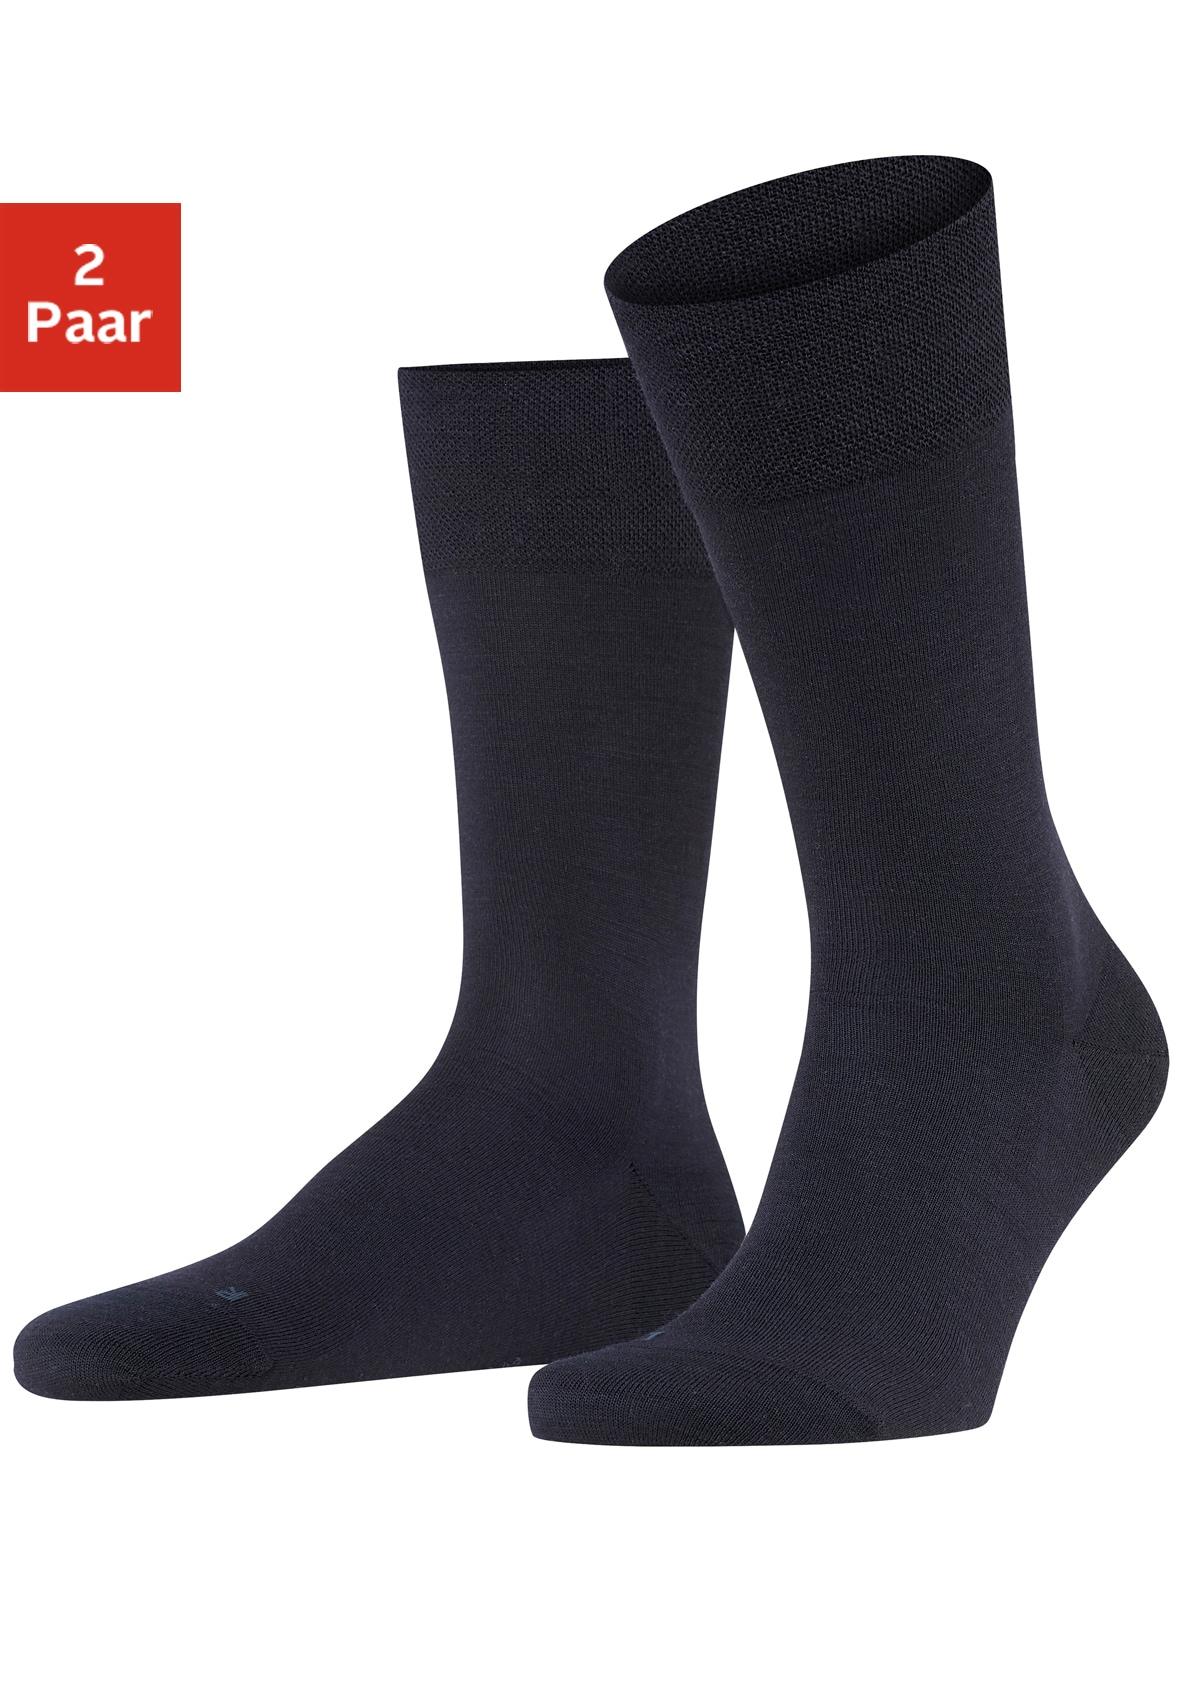 FALKE Socken Berlin (2 Paar)   Bekleidung > Wäsche   Blau   Baumwolle - Schurwolle   Falke